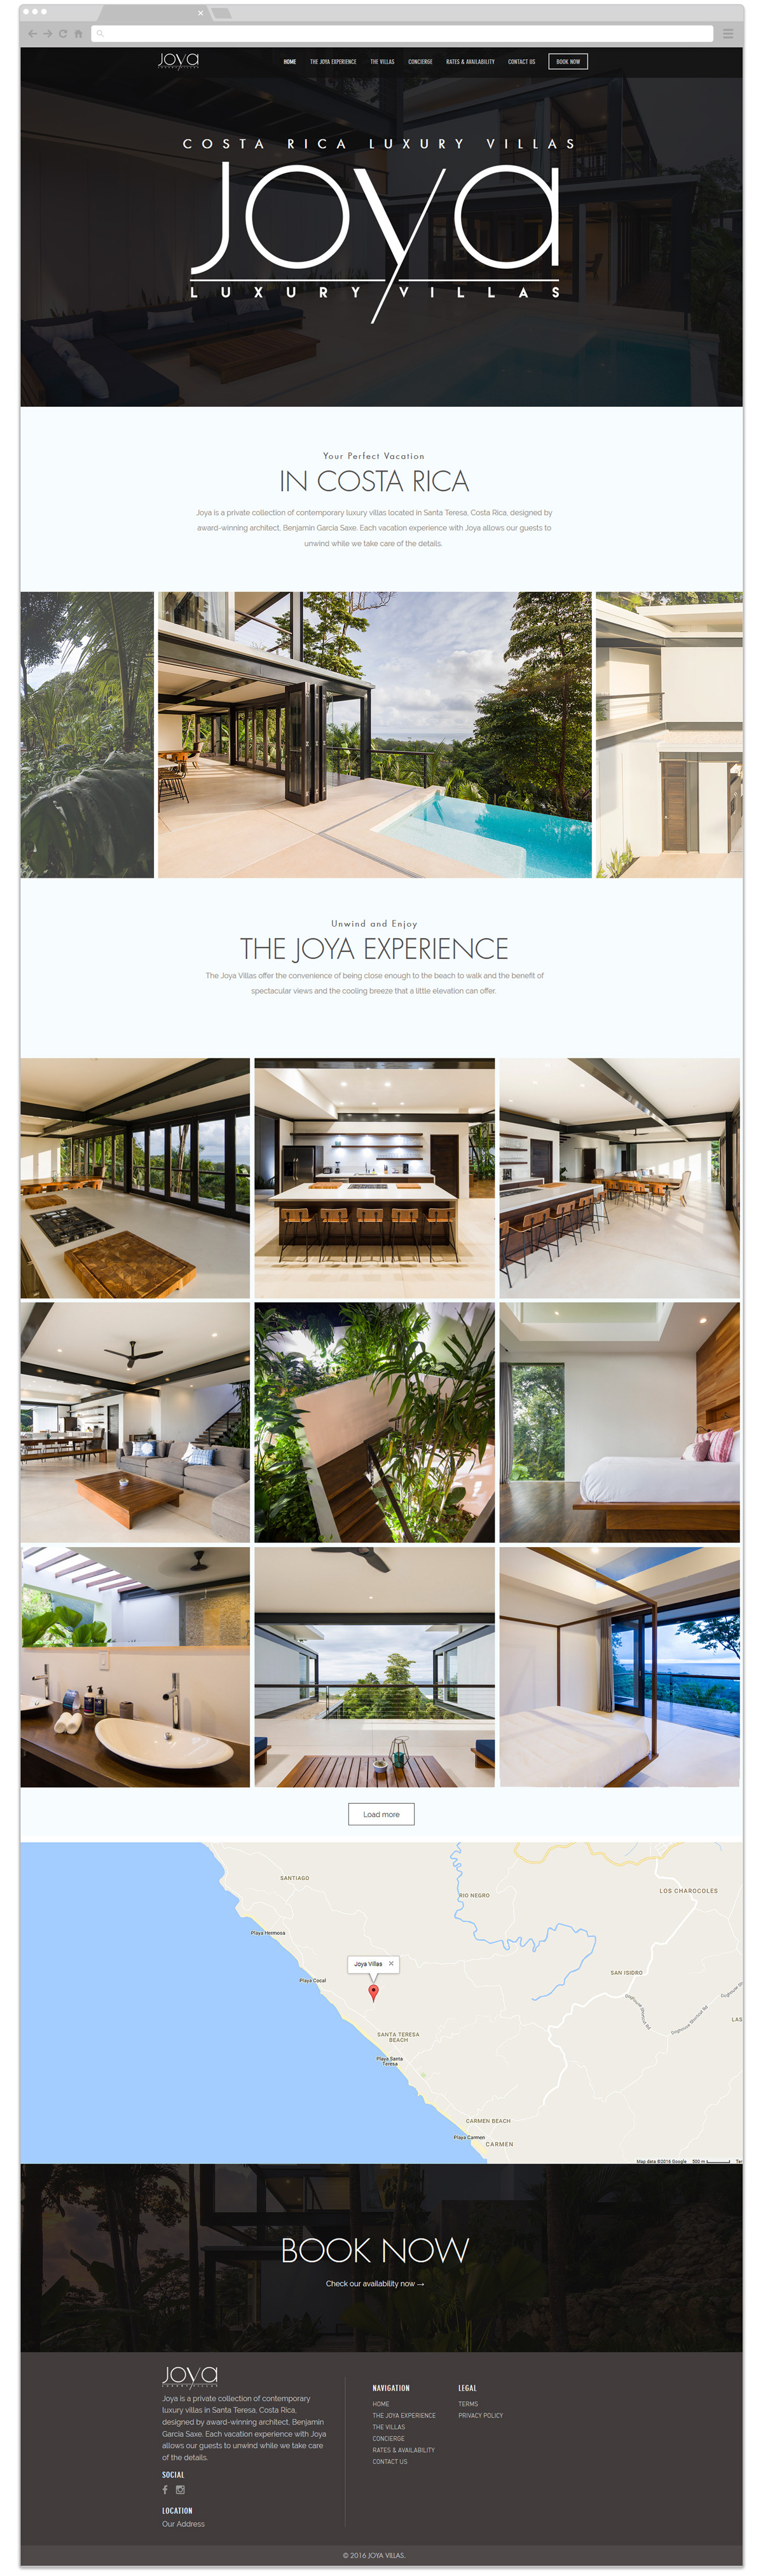 river-stone-creative-co-websites-joya-villas-1